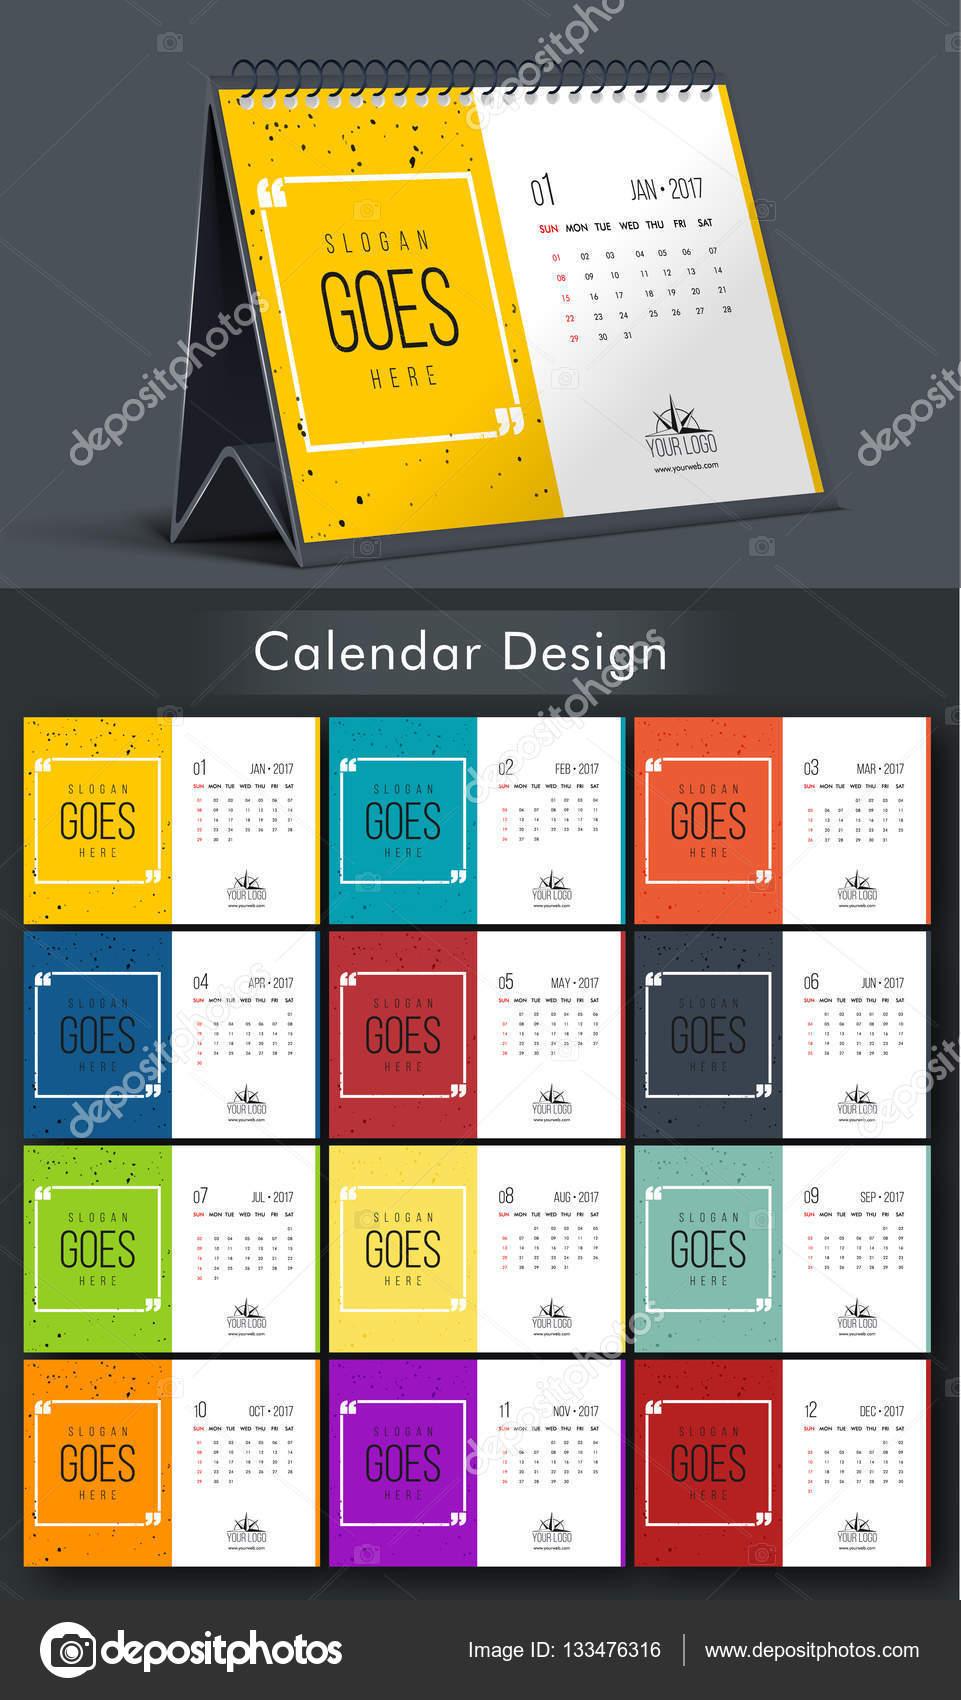 Calendar Typography Zenfolio : 다채로운 해마다 달력 디자인 — 스톡 벡터 alliesinteract